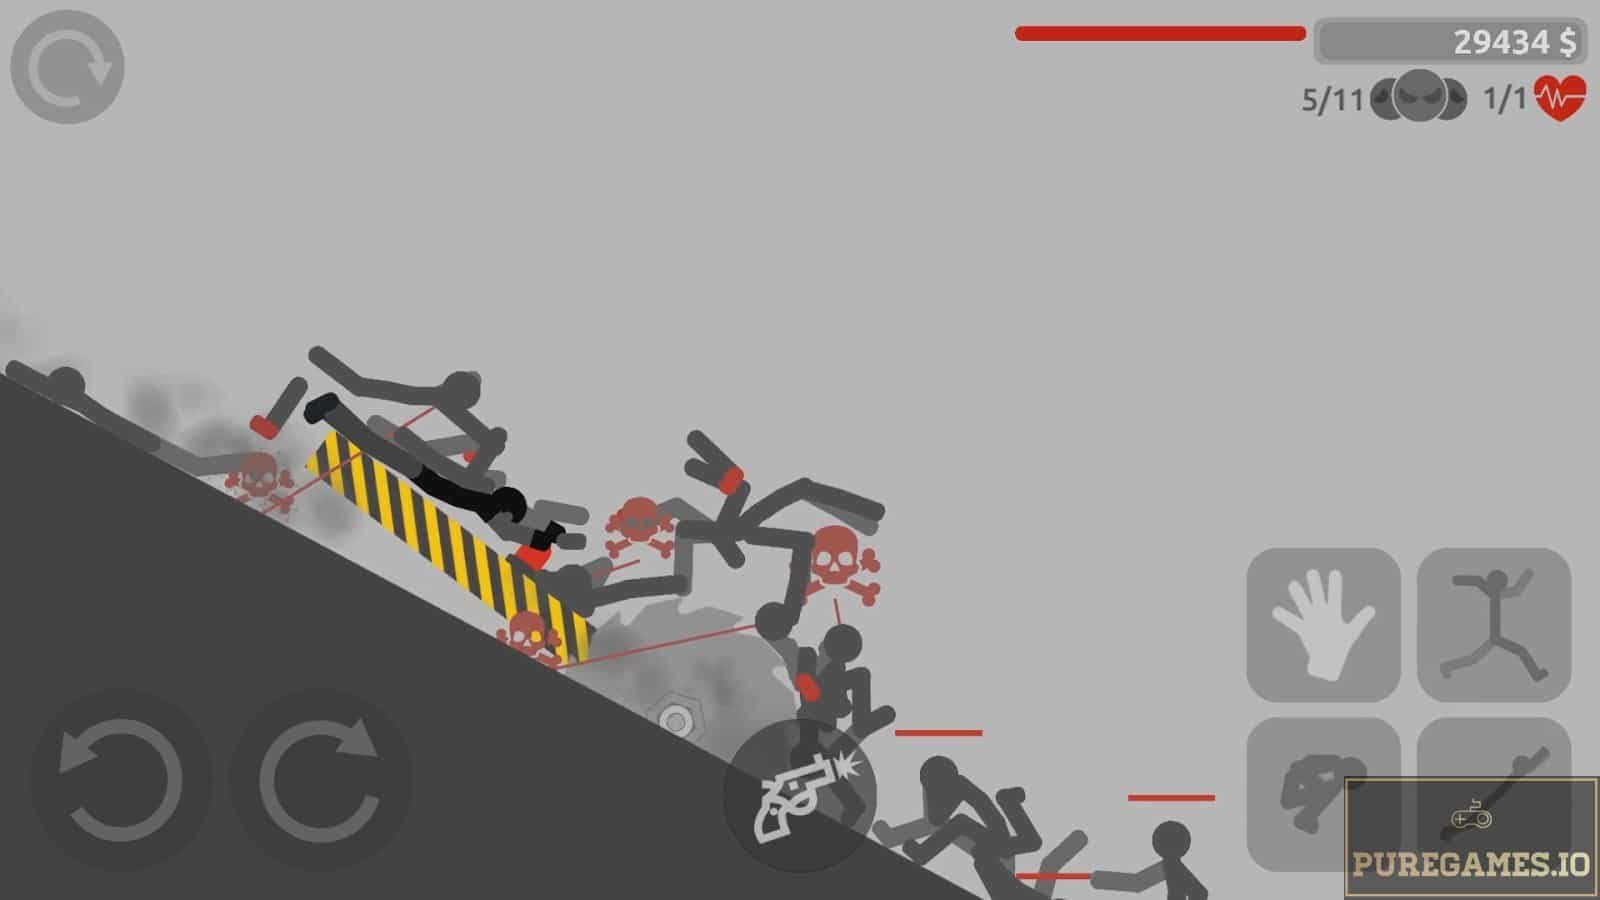 Download Stickman Backflip Killer 4 MOD APK for Android - PureGames